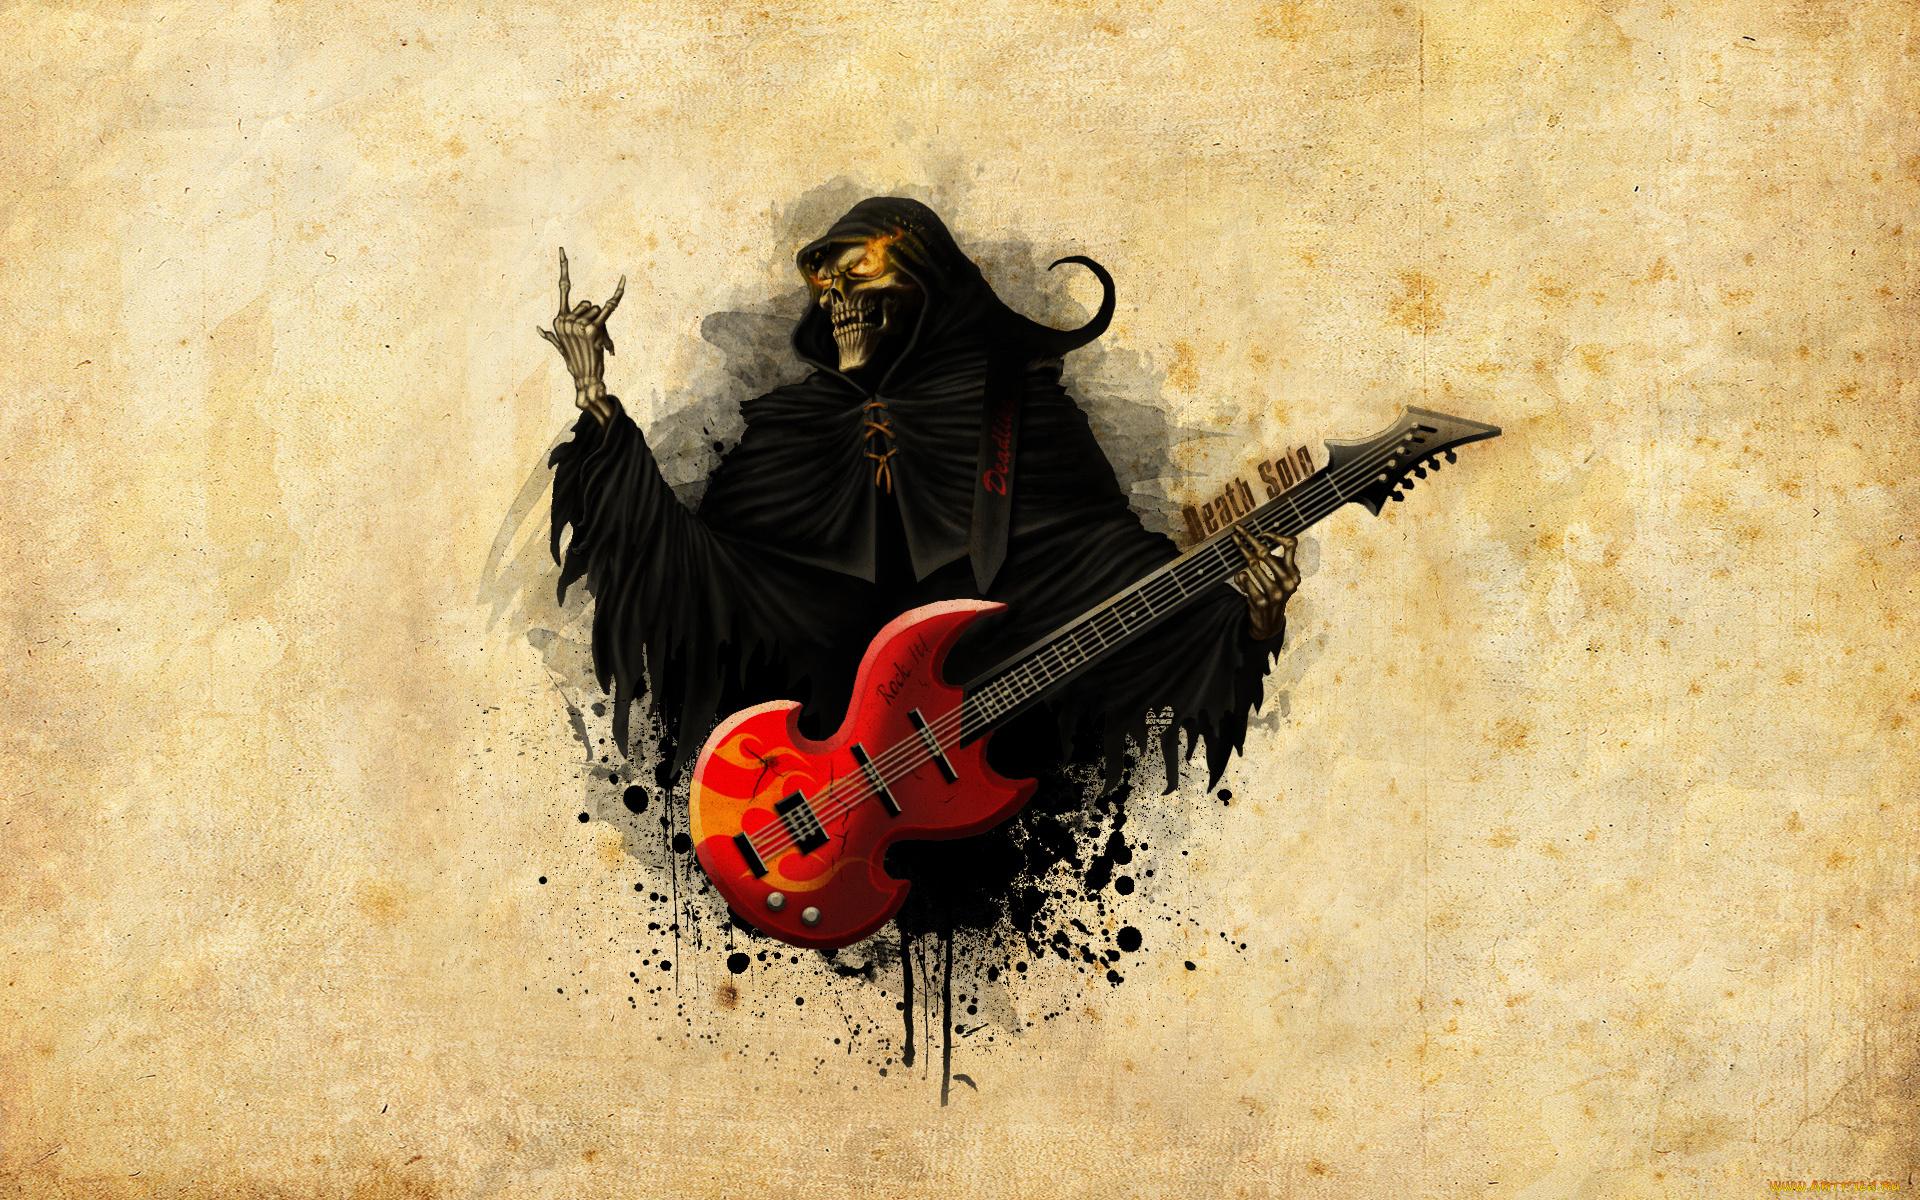 Февраля фоны, картинки на тему рок металл